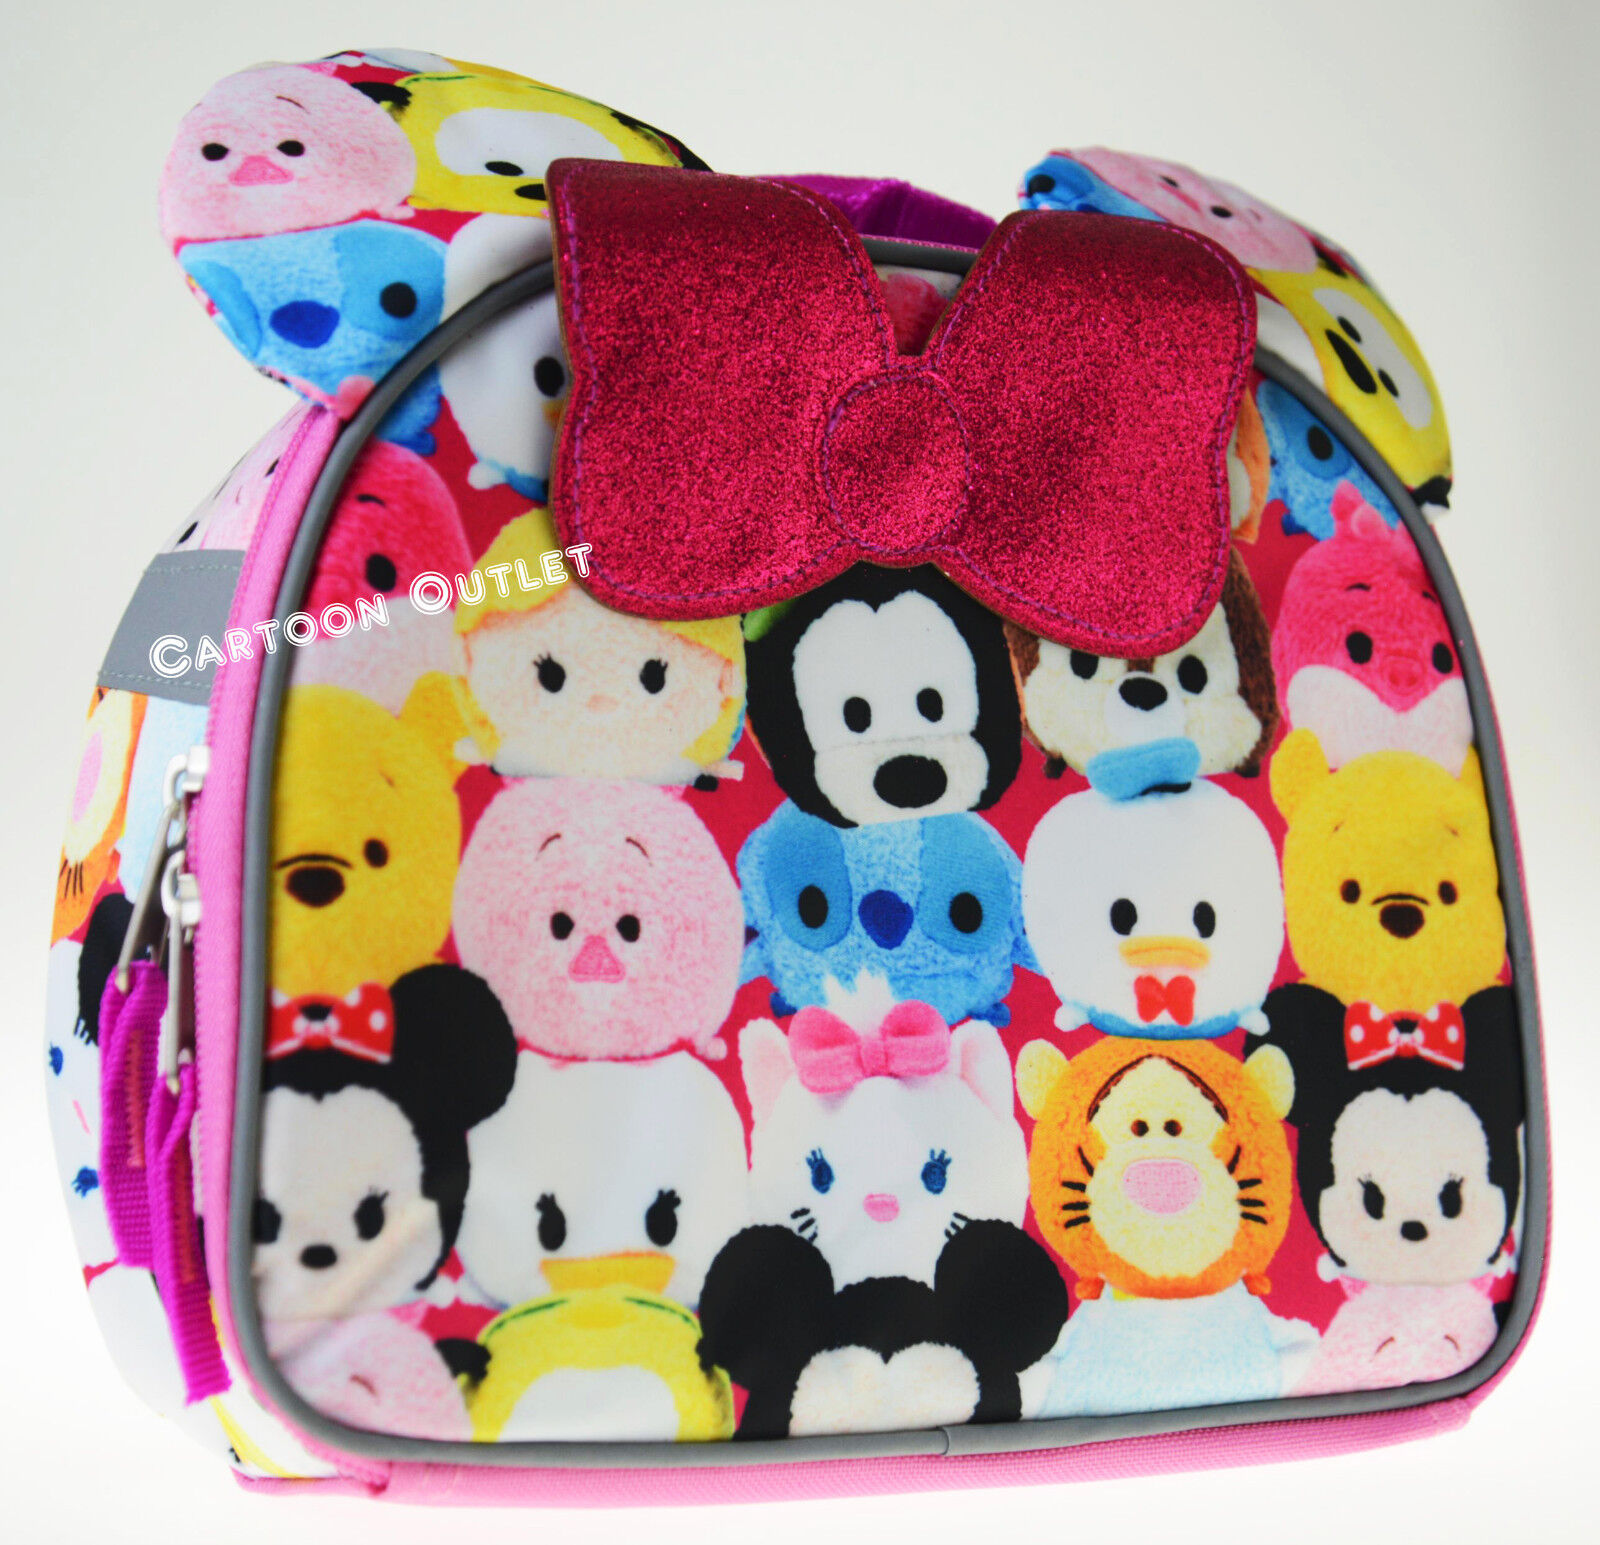 MINNIE MOUSE GIRLS PINK TSUM TSUM LUNCH BAG DISNEY SCHOOL IN